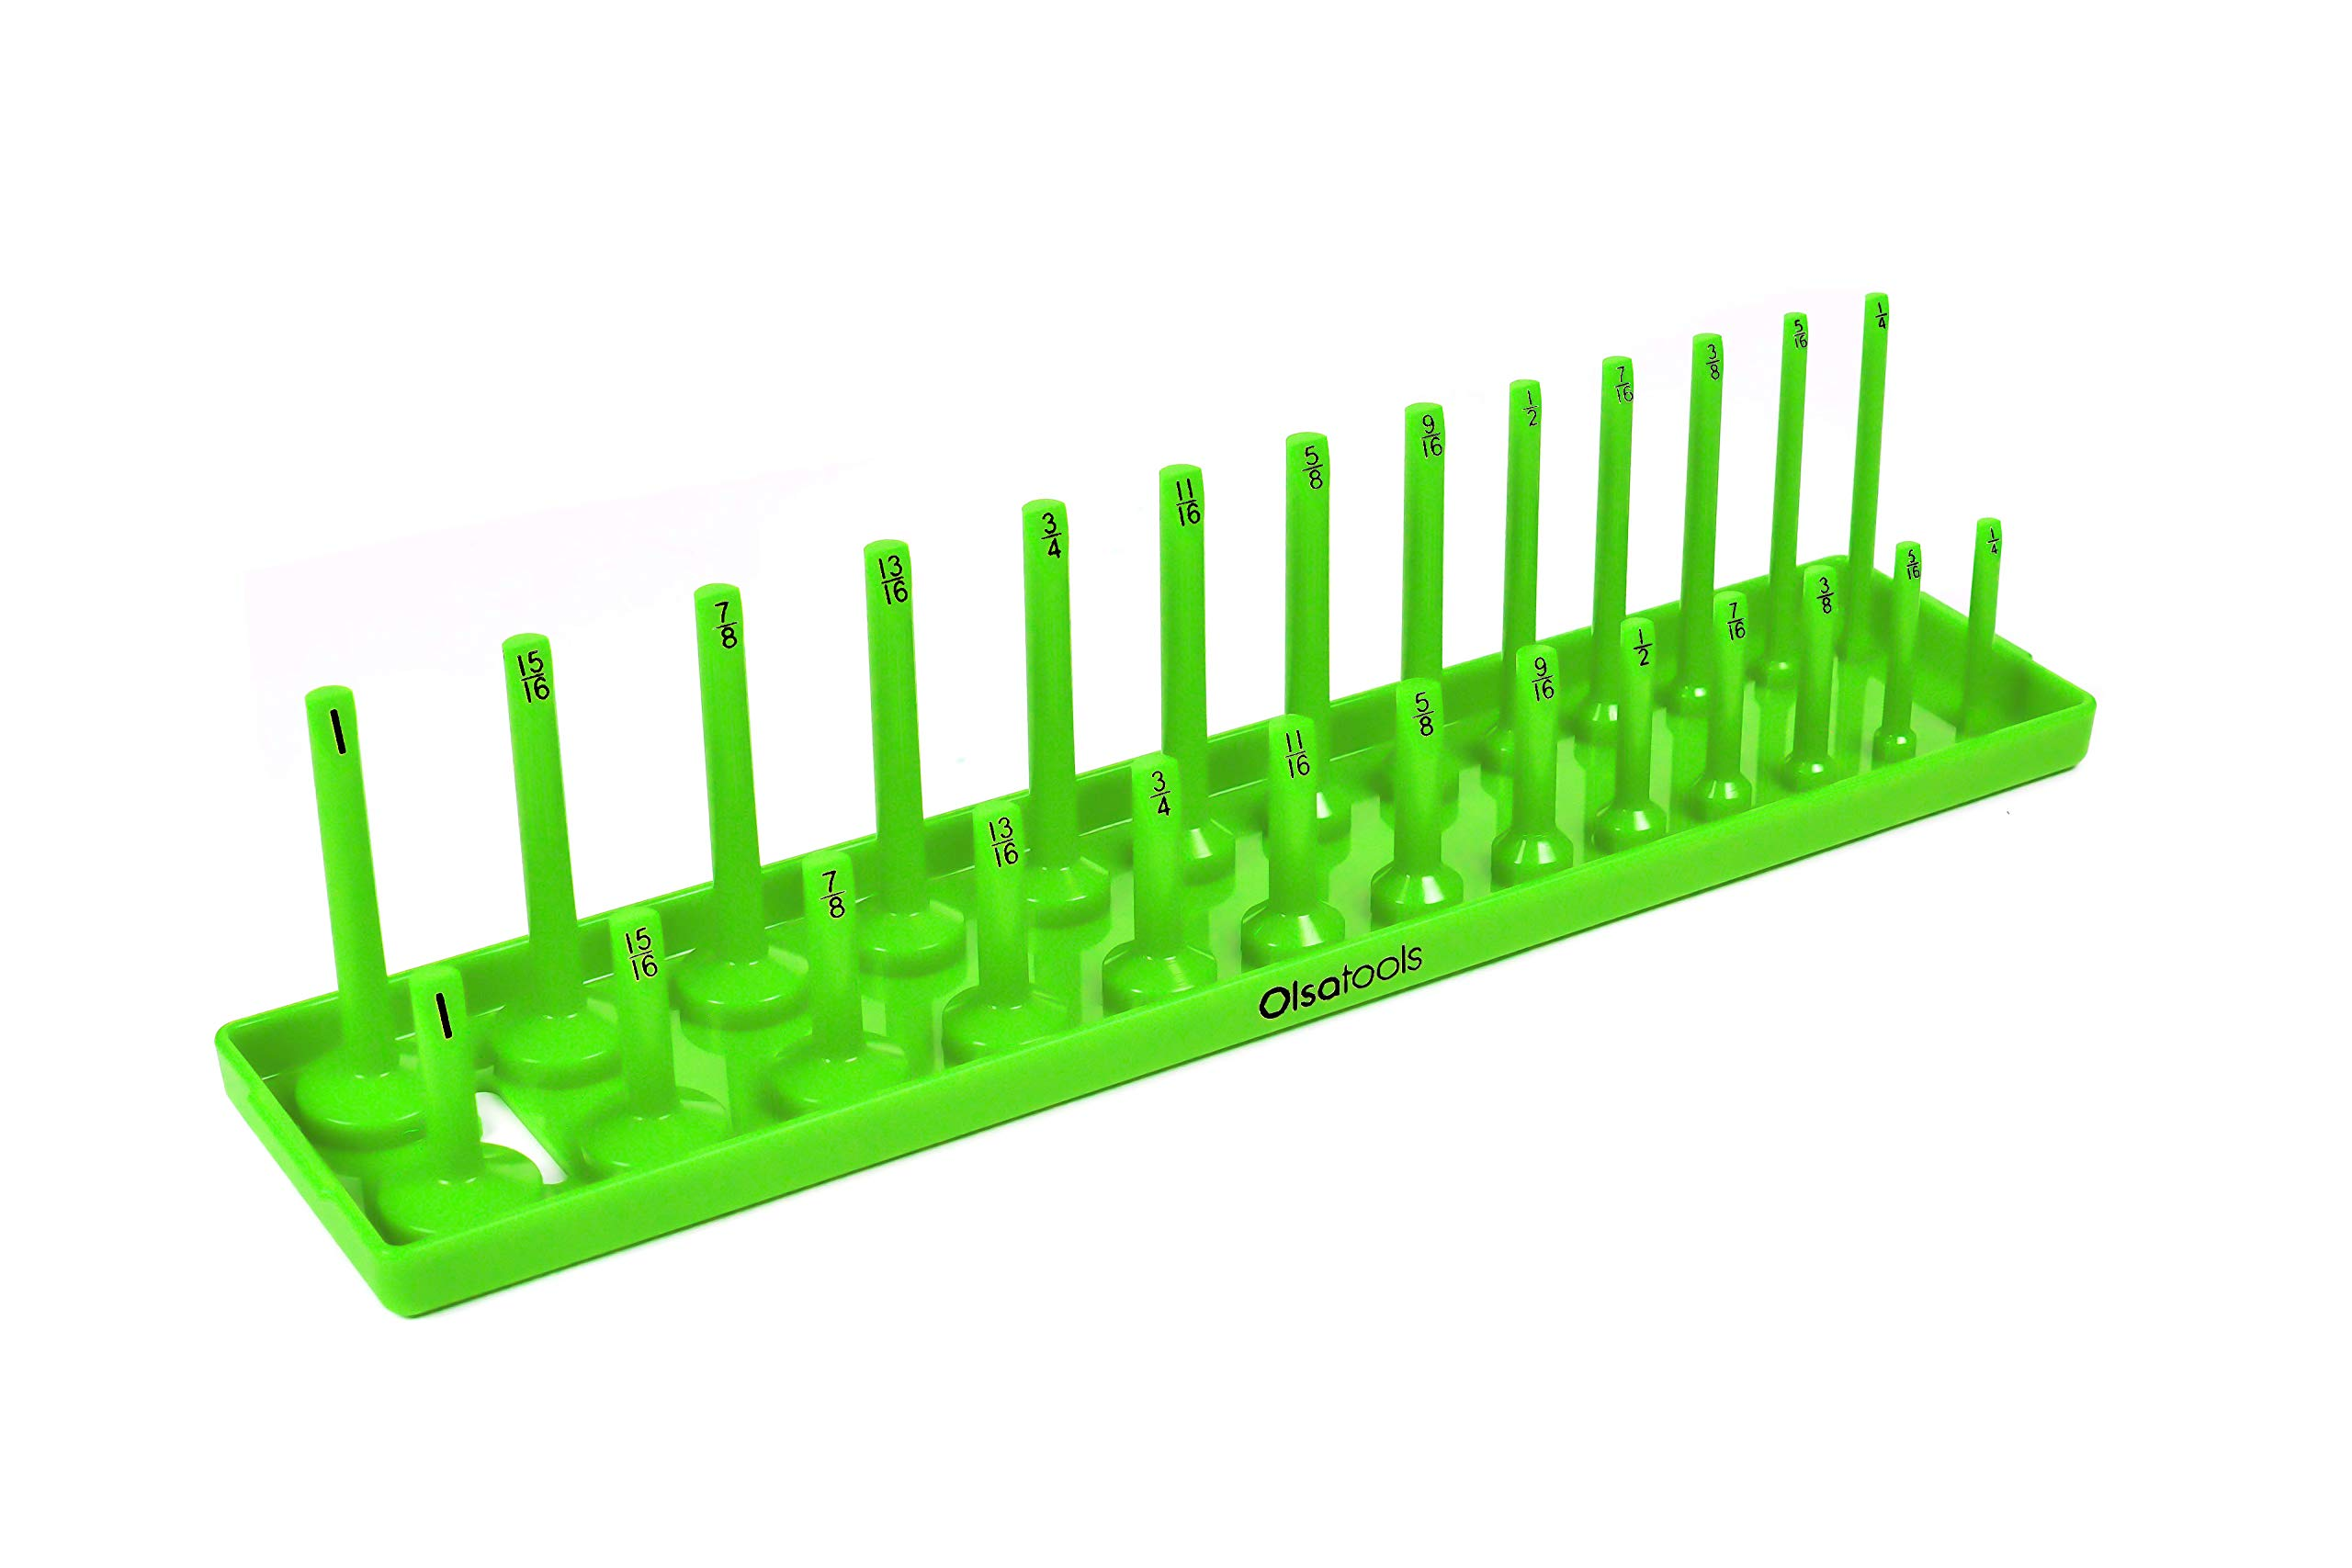 Olsa Tools   3/8-Inch Drive Socket Organizer Tray   Green SAE Socket Holder   Premium Quality Tool Organizer